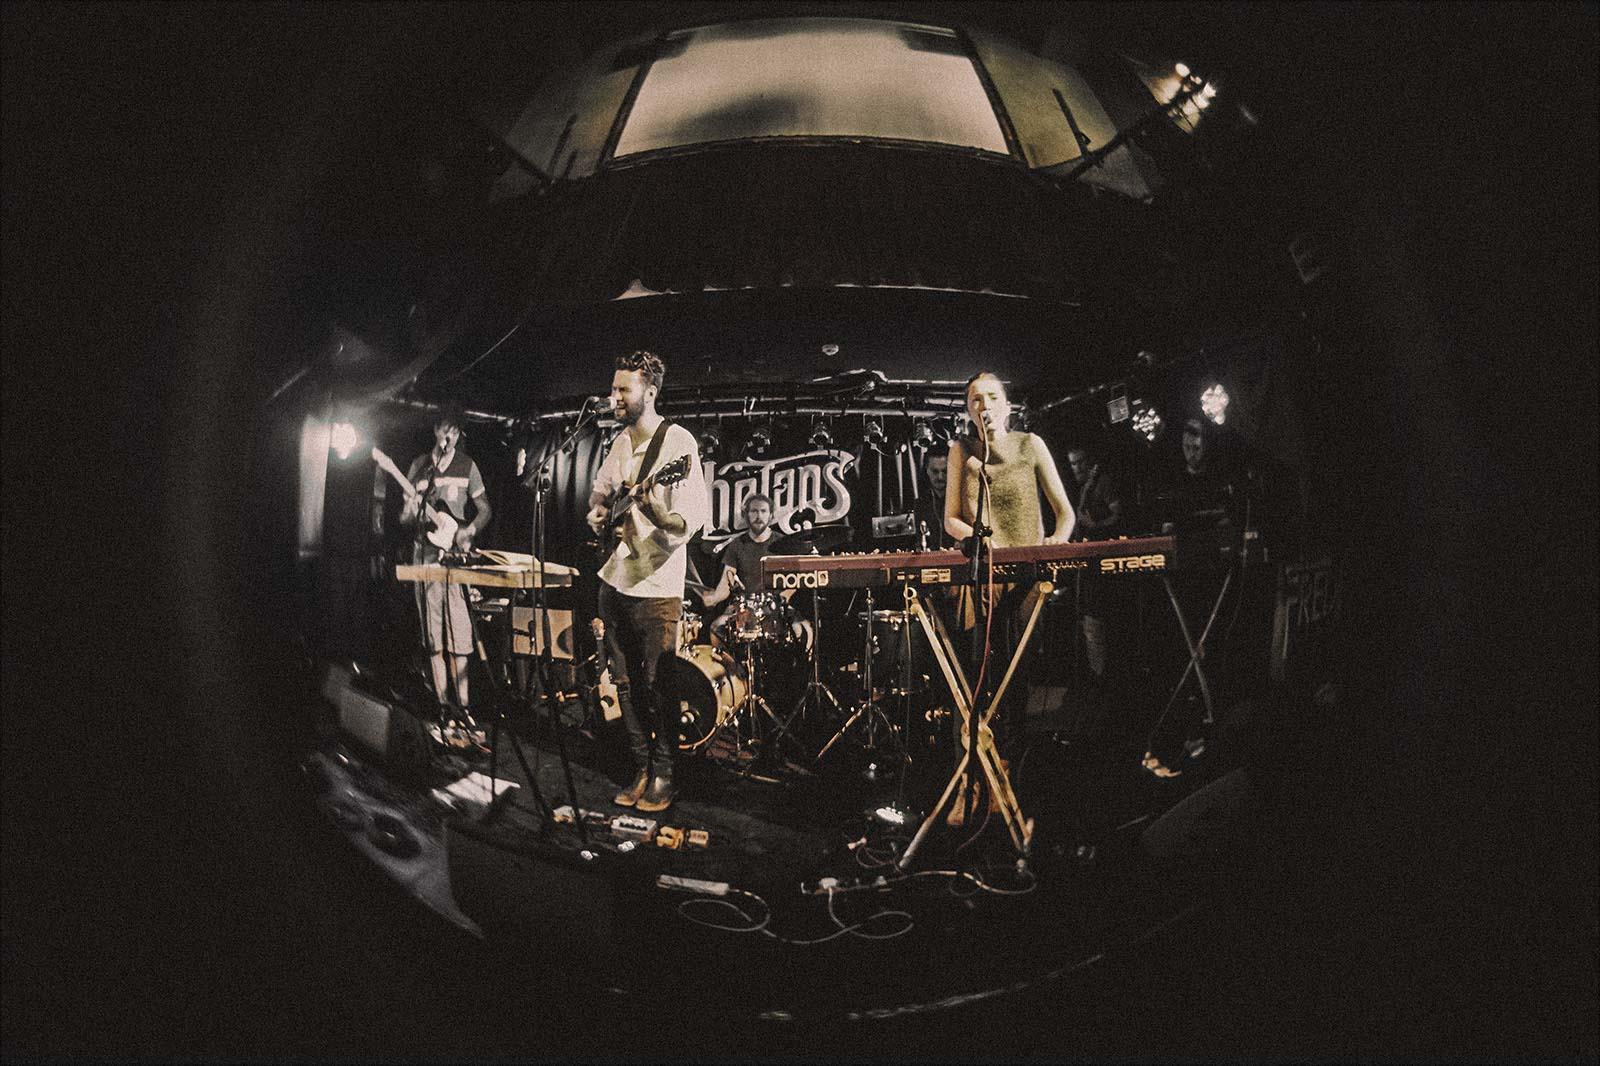 come_on_live_long_album_launch_whelans_dublin016.jpg